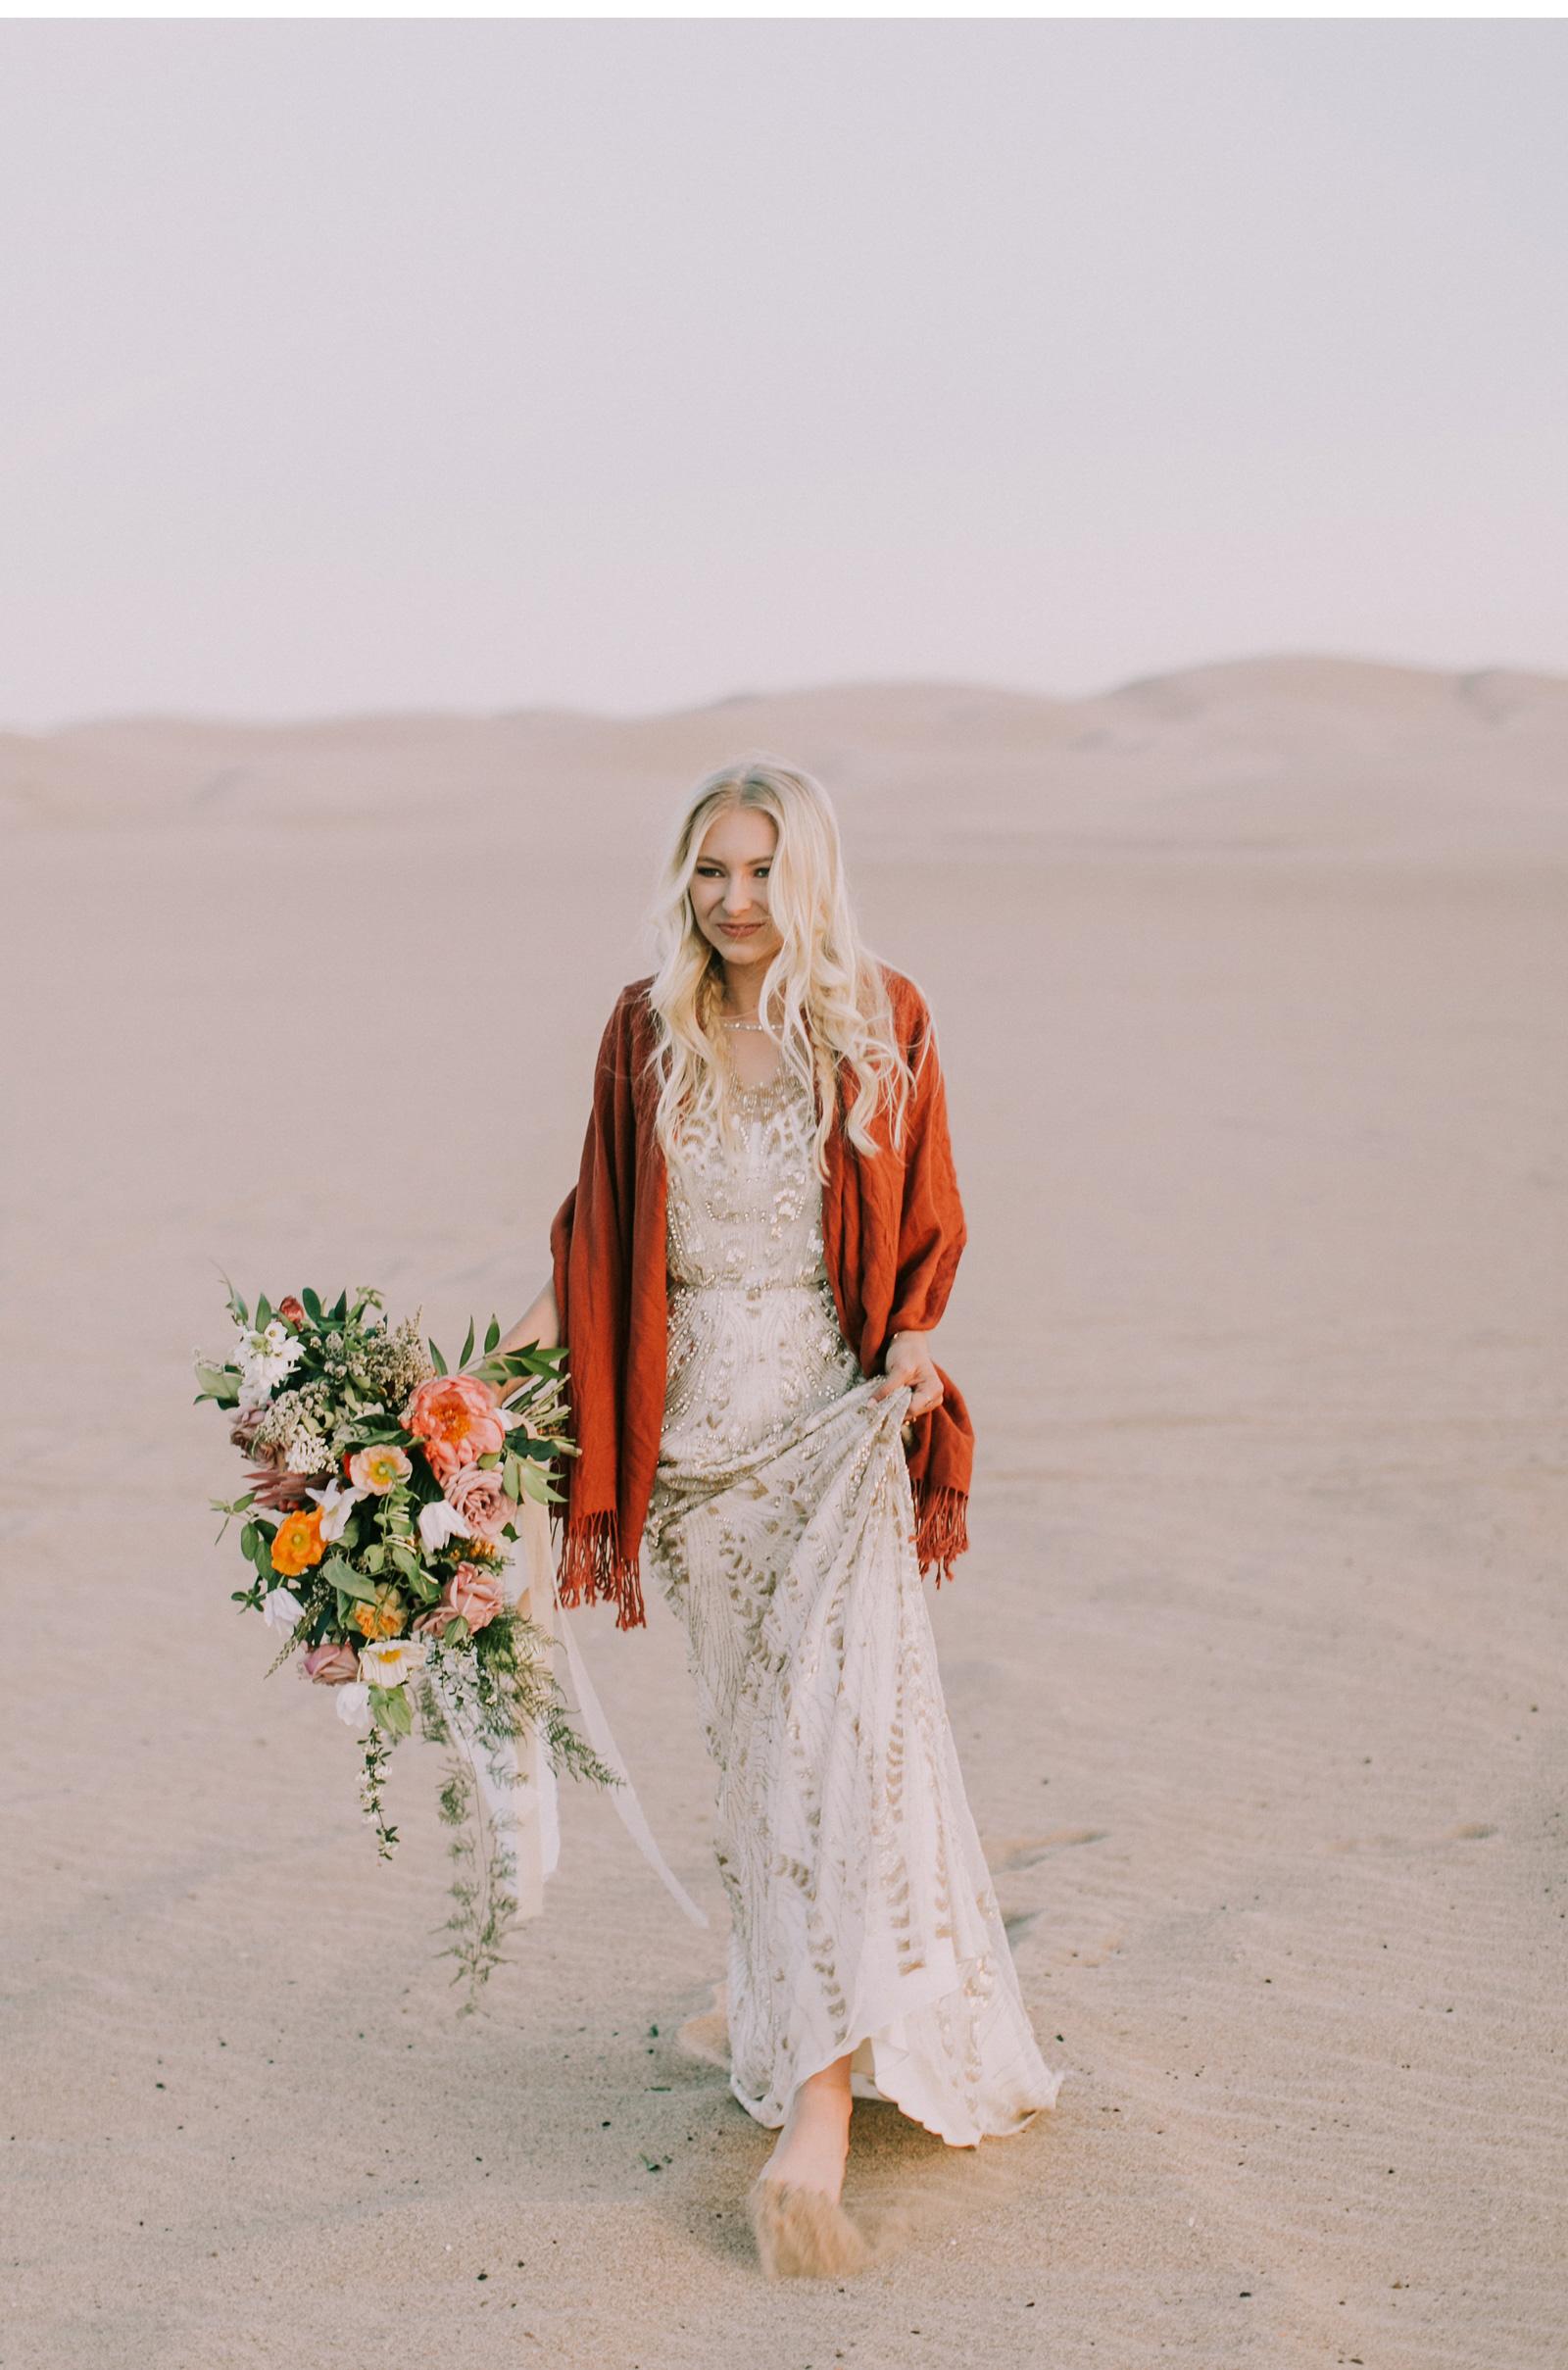 Desert-Wedding-Free-People-Wedding-Natalie-Schutt-Photography_05.jpg